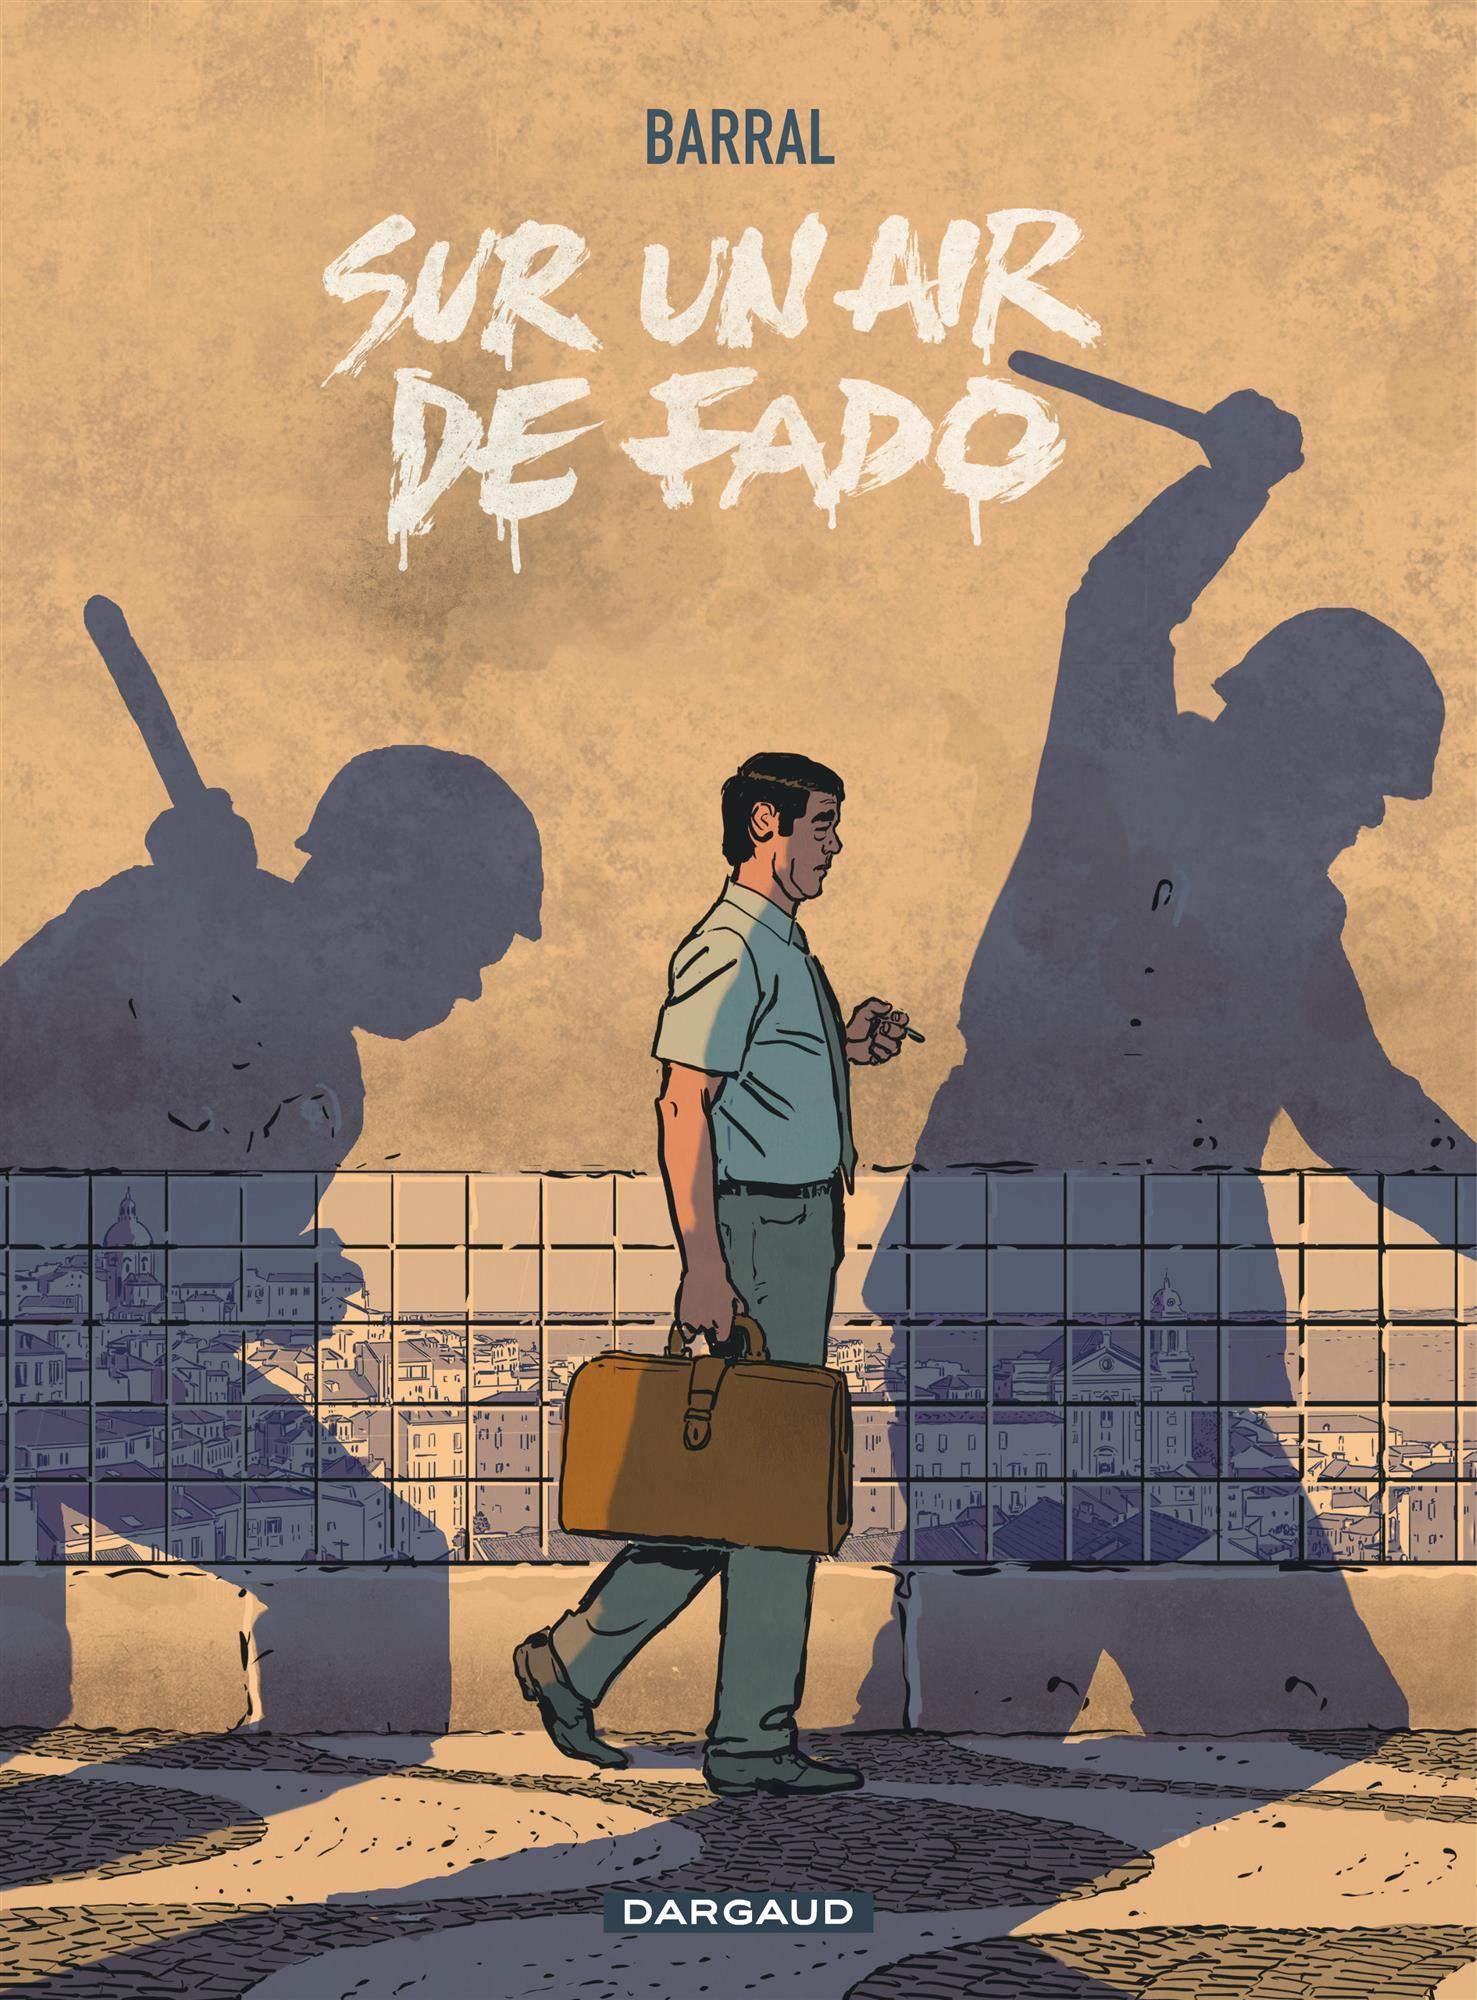 La dictature est toujours un lourd fado... (Dargaud 2021).